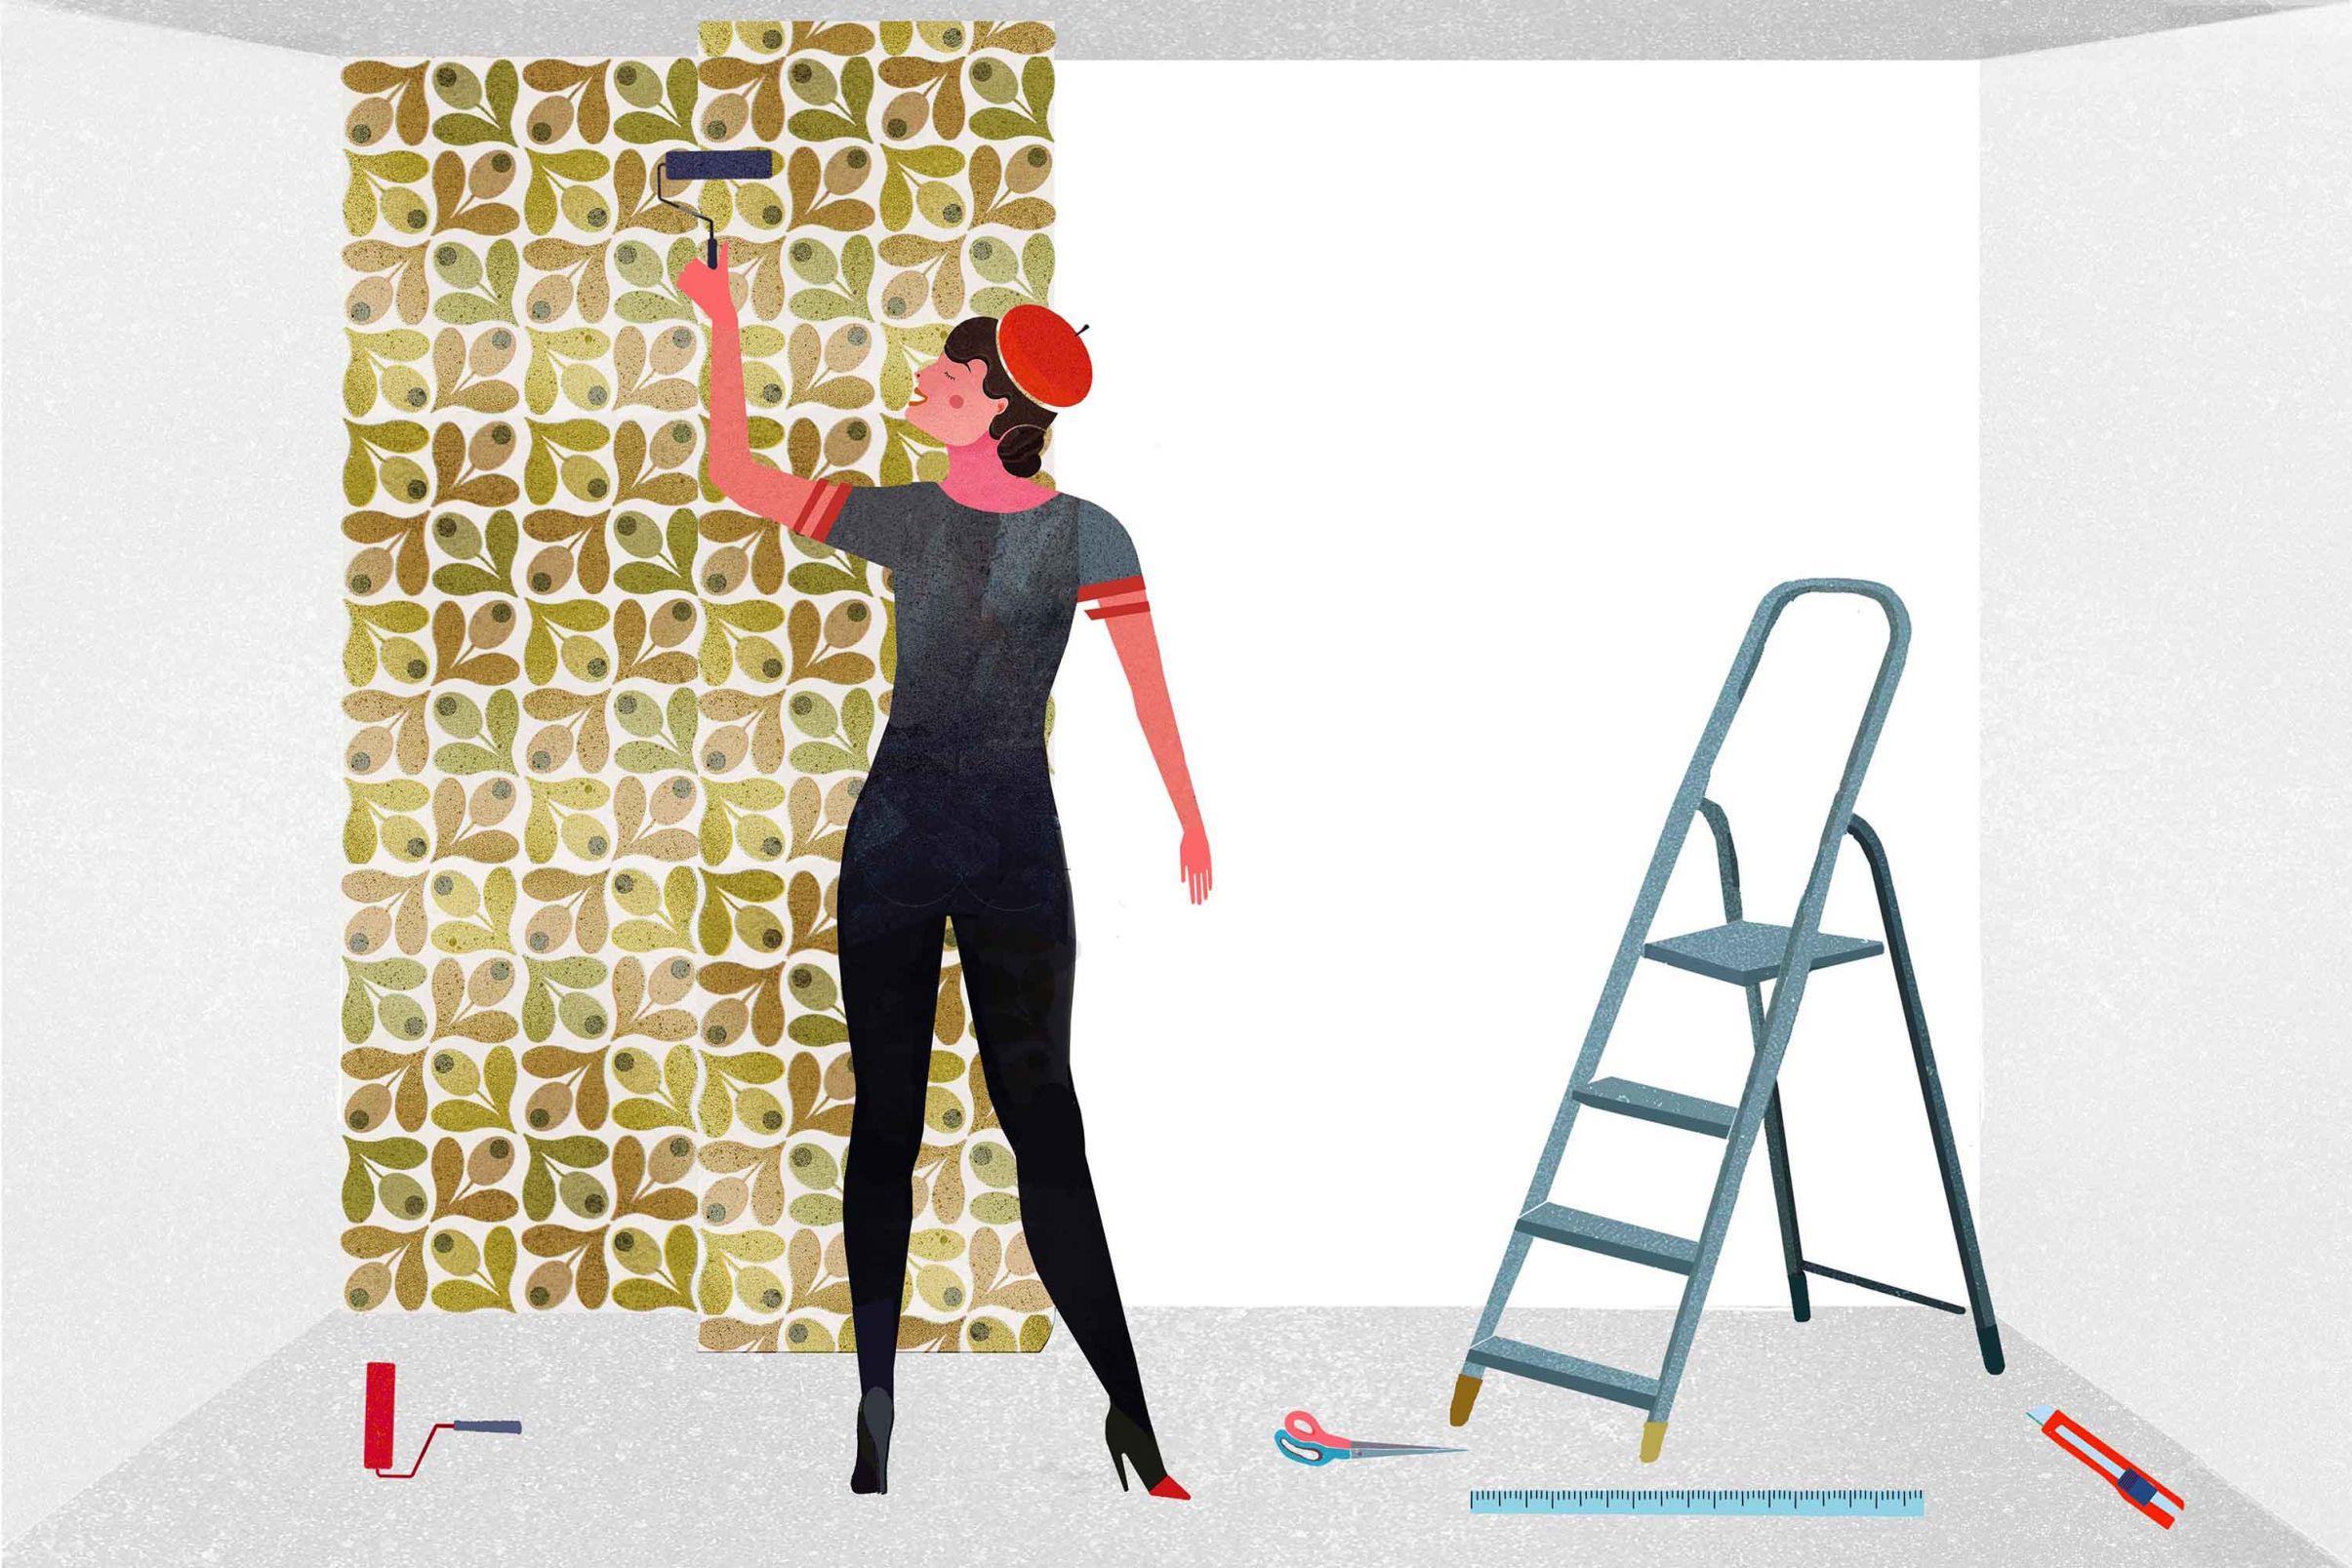 Como-pendurar-papel-de-parede-TNT-Prensar-o-papel-de-parede-na-parede-tendo-especial-atencao-as-juncoes